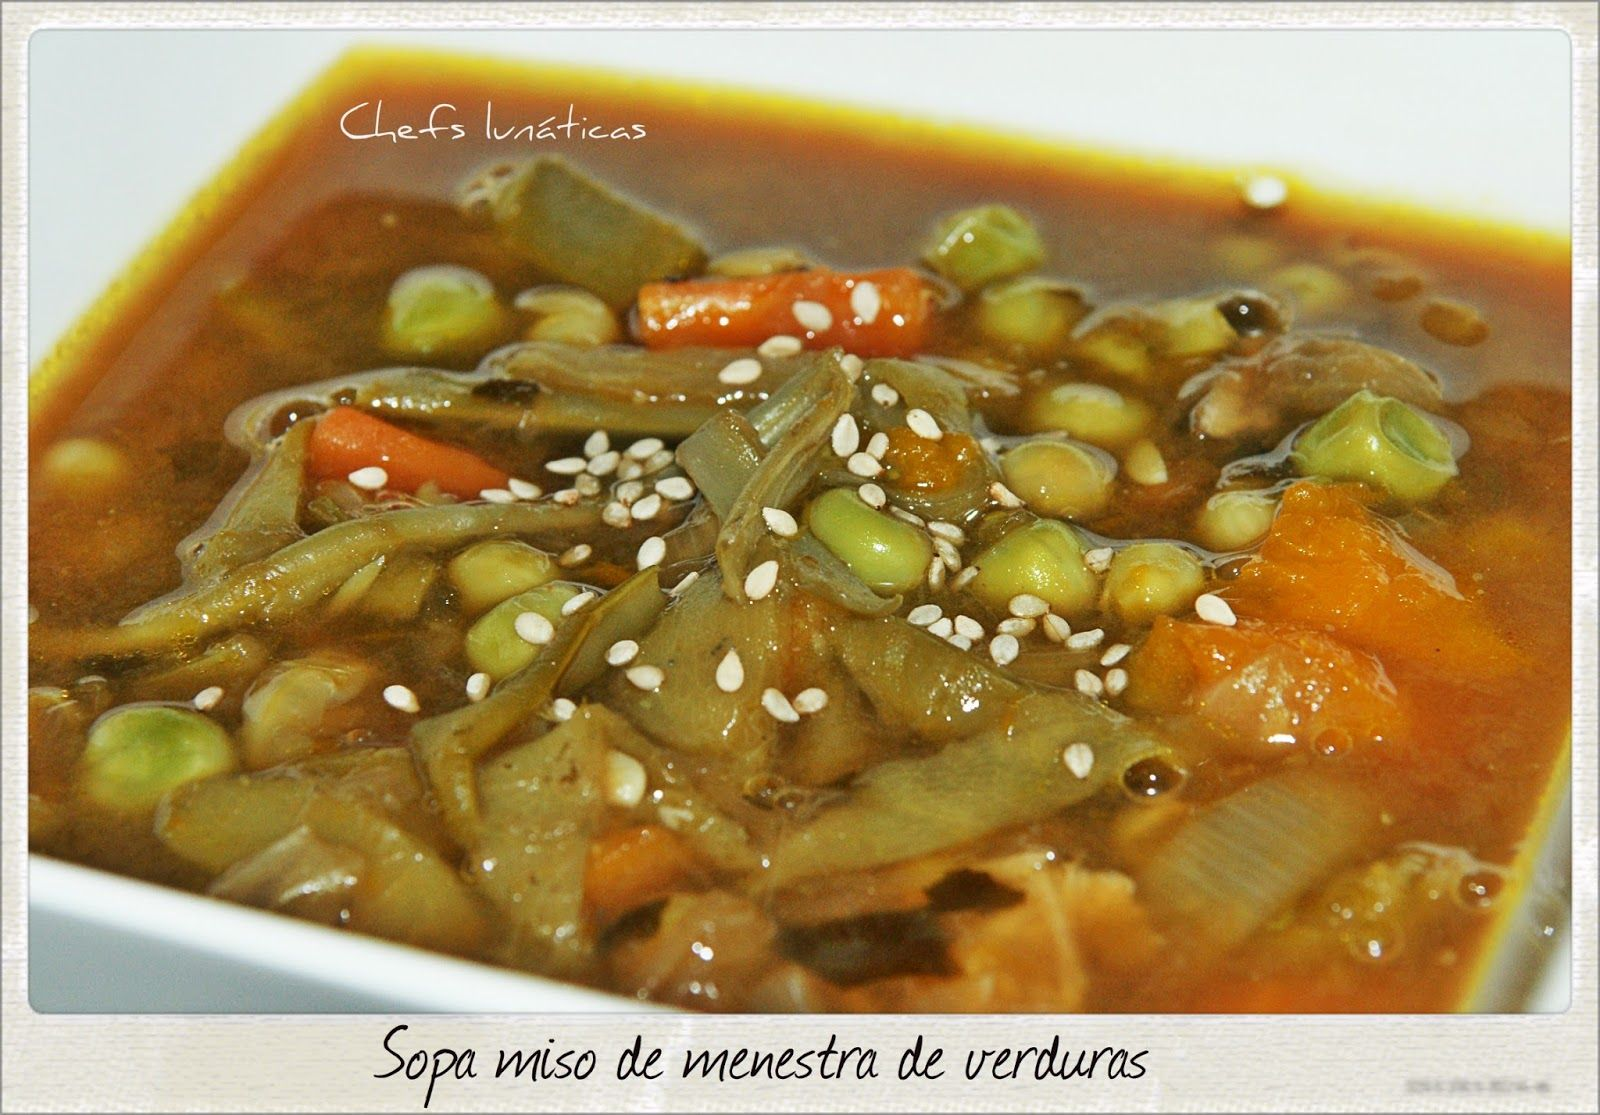 Sopa Miso De Menestra De Verduras Menestra De Verduras Verduras Guisantes